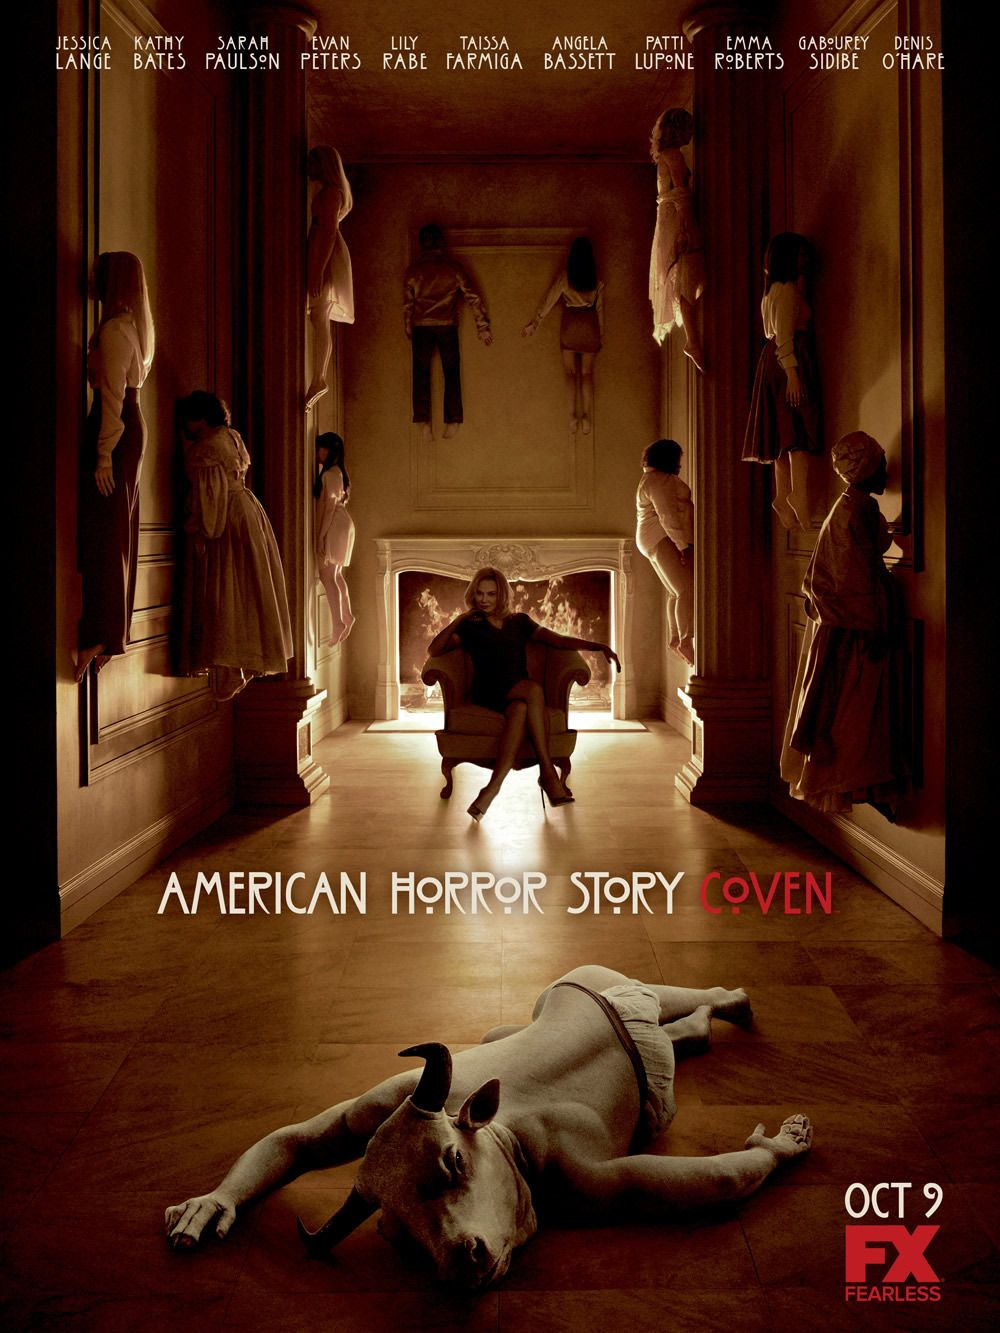 American Horror Story Coven Poster All Multidao Historias De